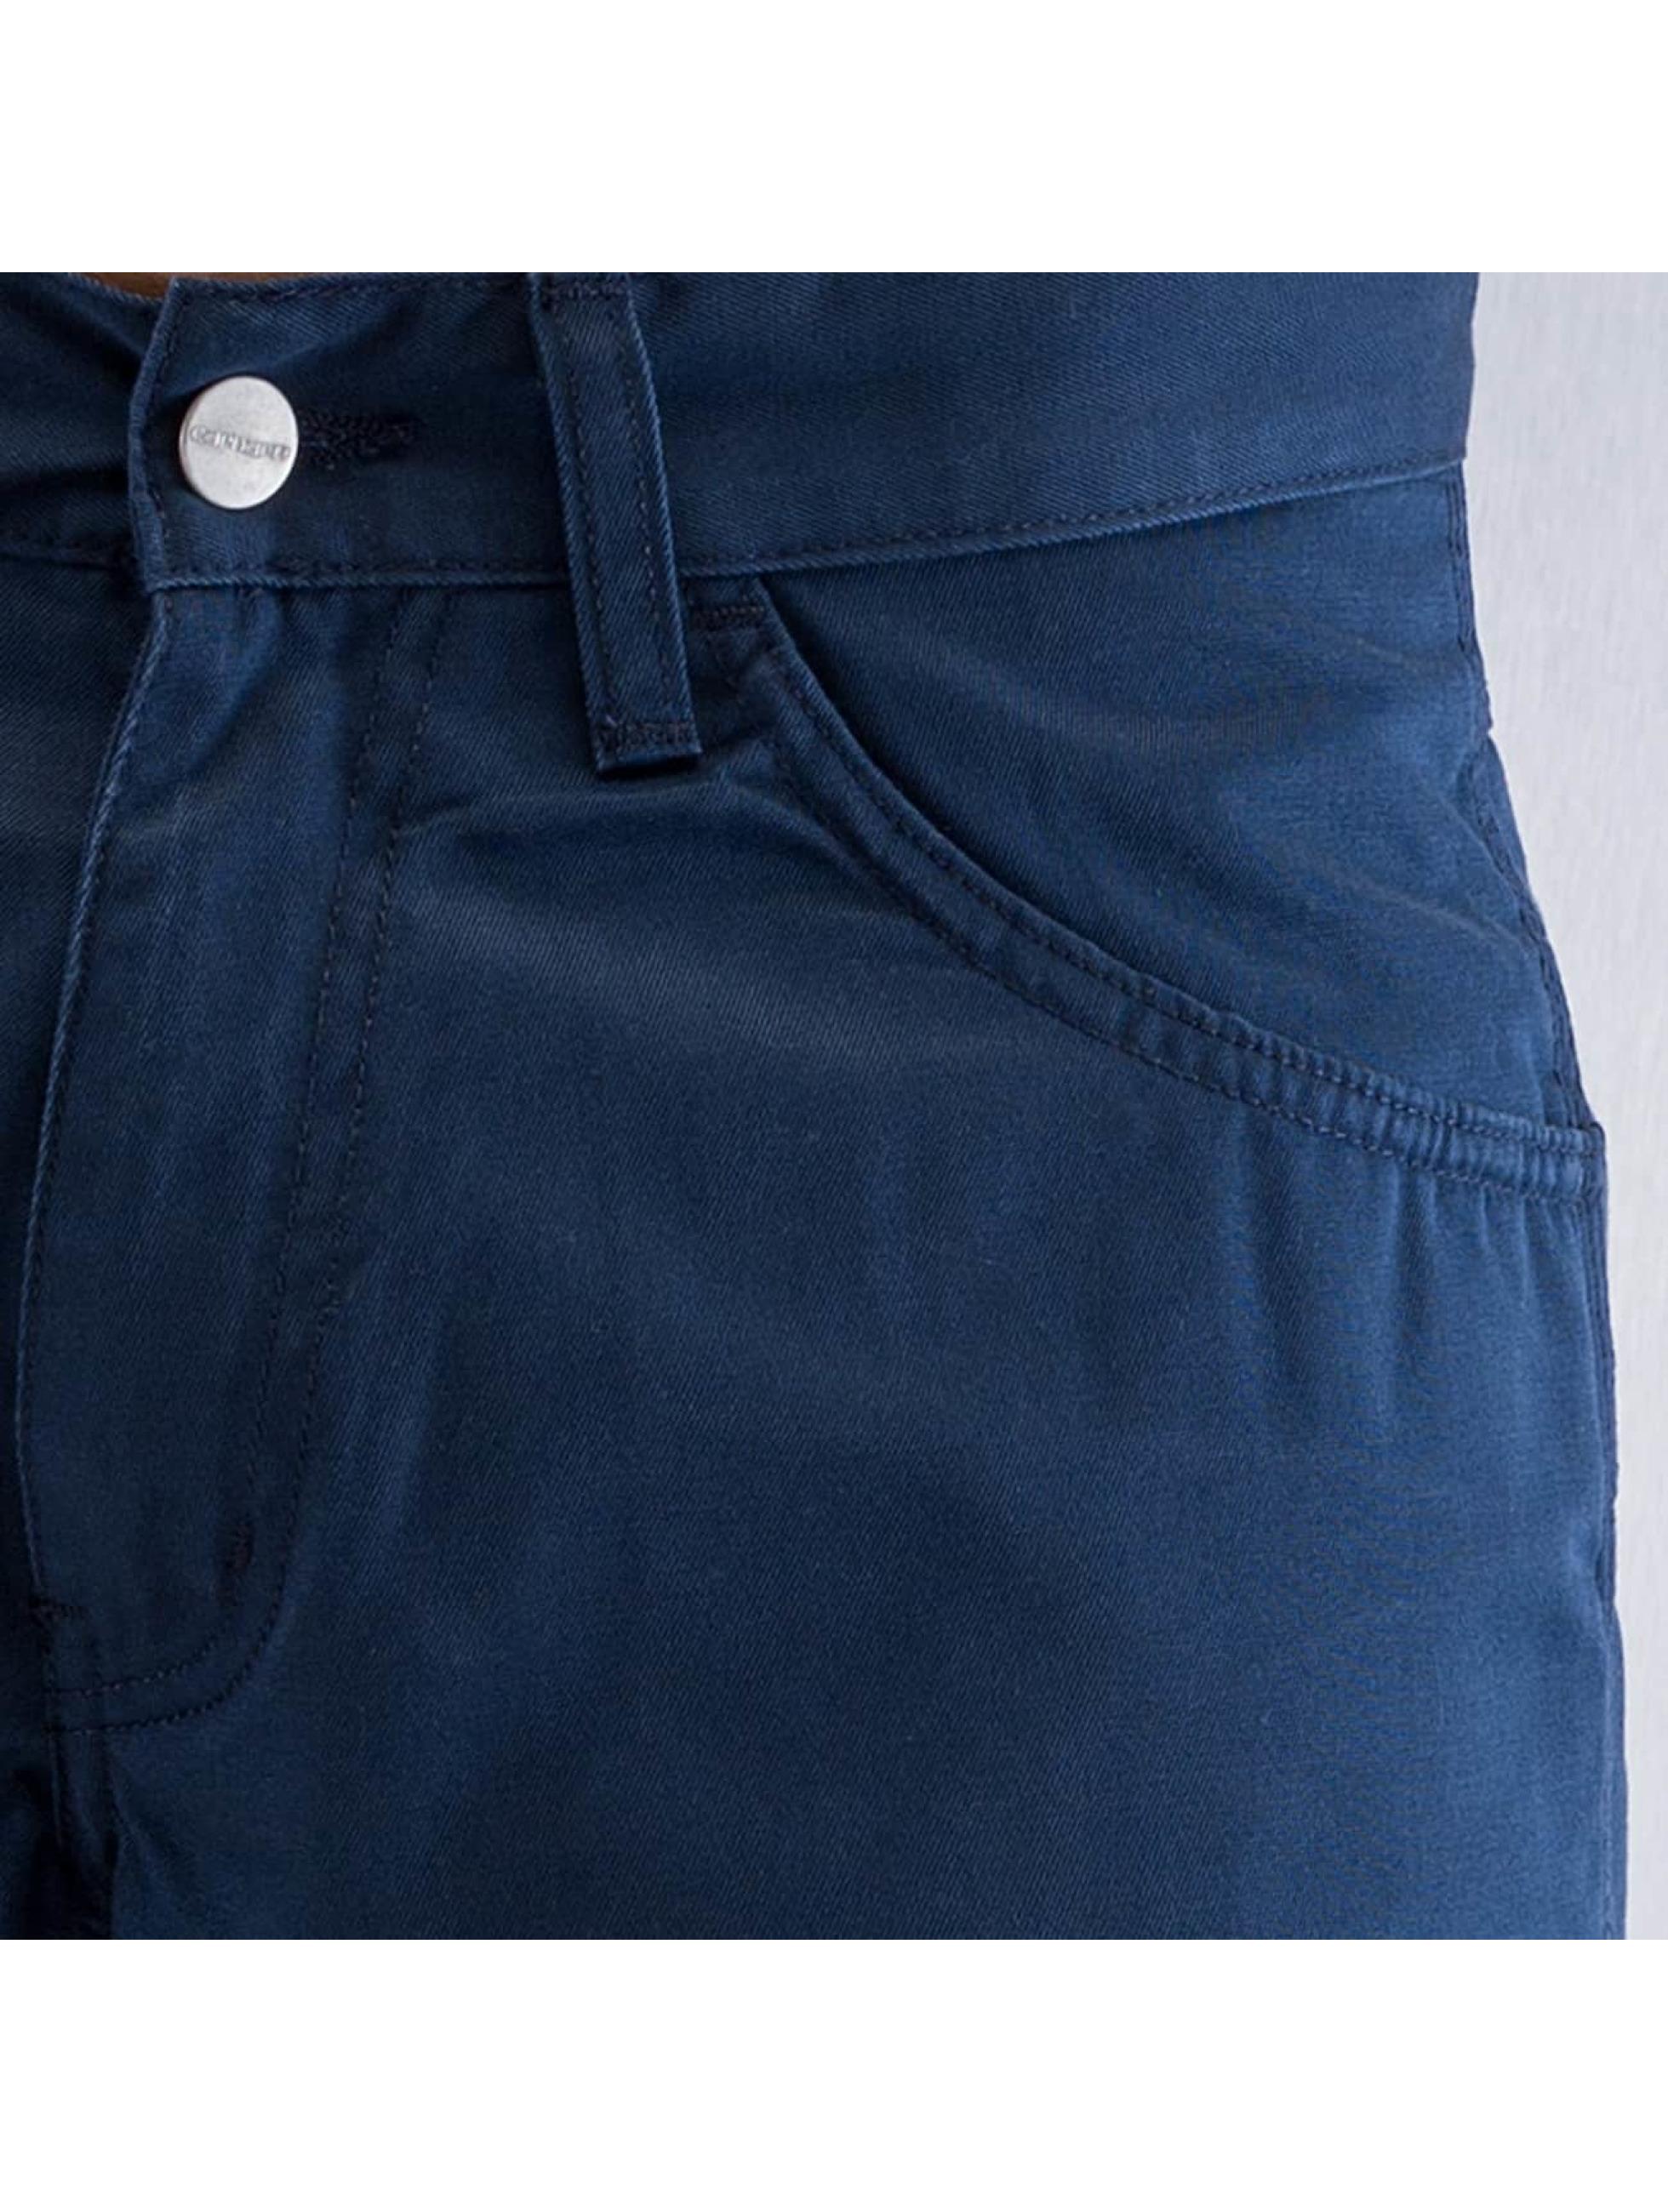 Carhartt WIP Джинсы-трубы Cortez Slim Fit Skill синий